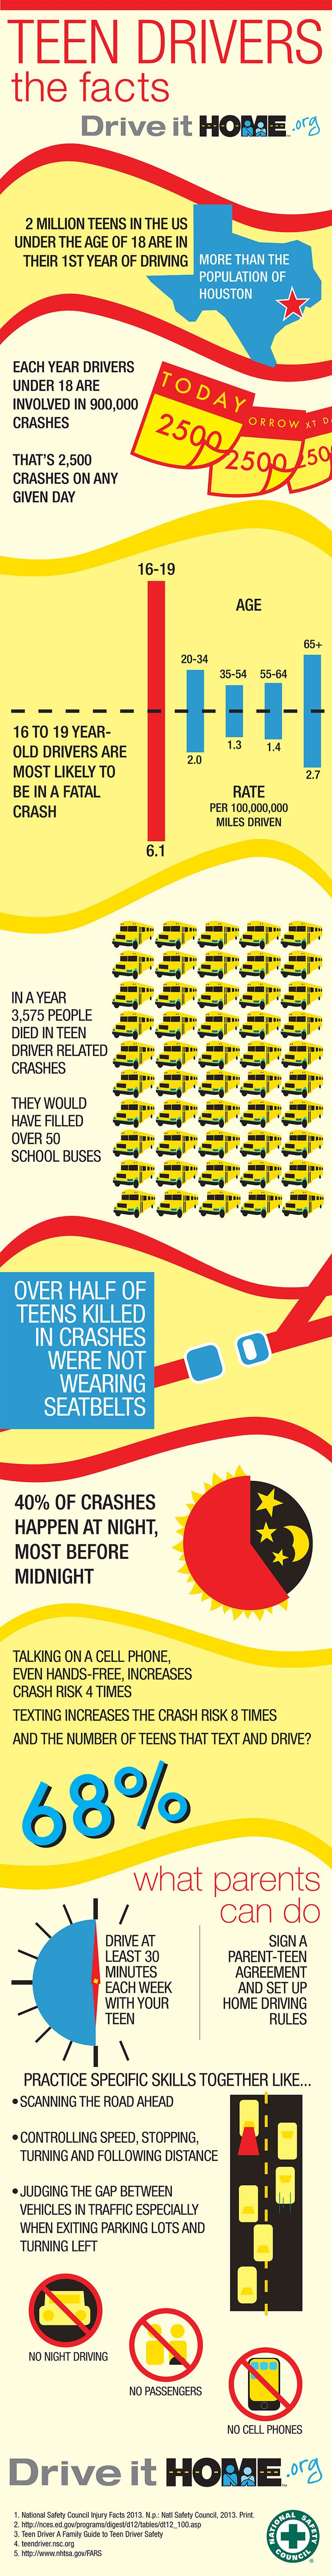 Safe teen passengers sobriety